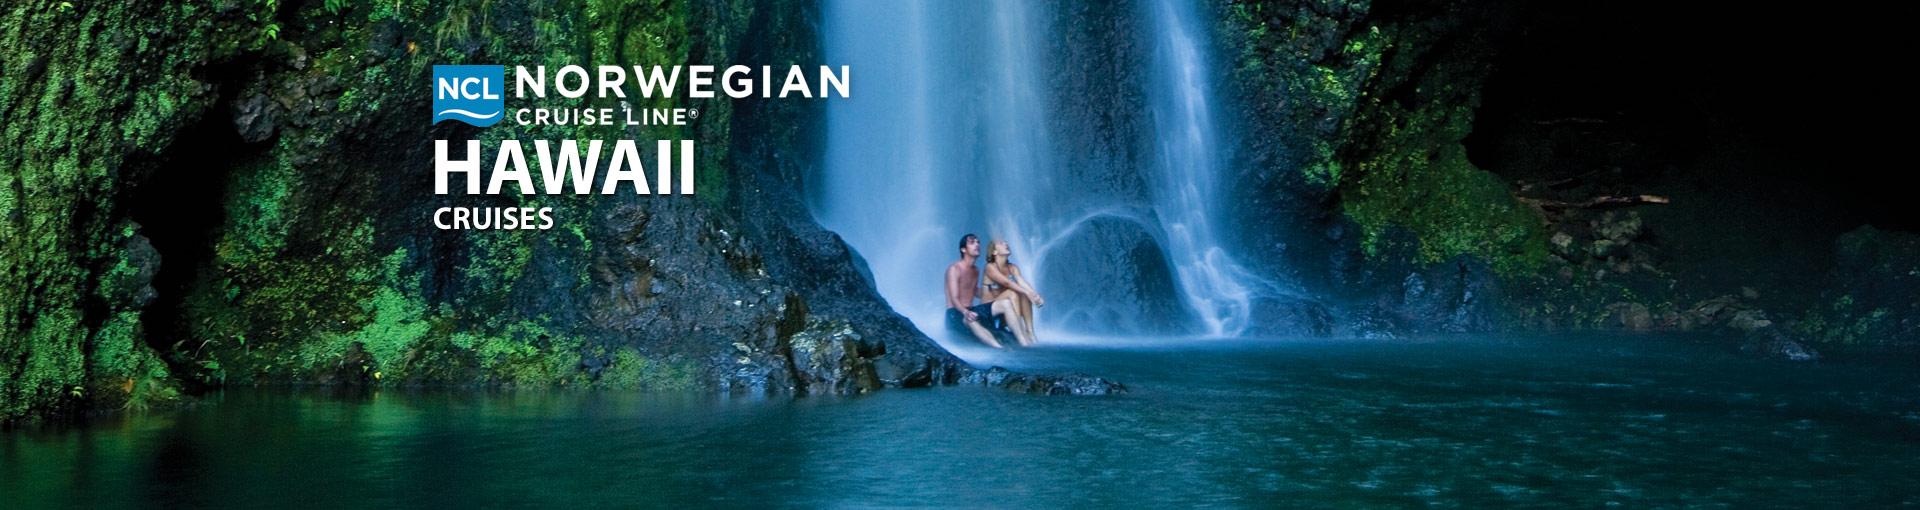 Norwegian Hawaii Cruises And Hawaiian Norwegian Cruises - Cruises from hawaii